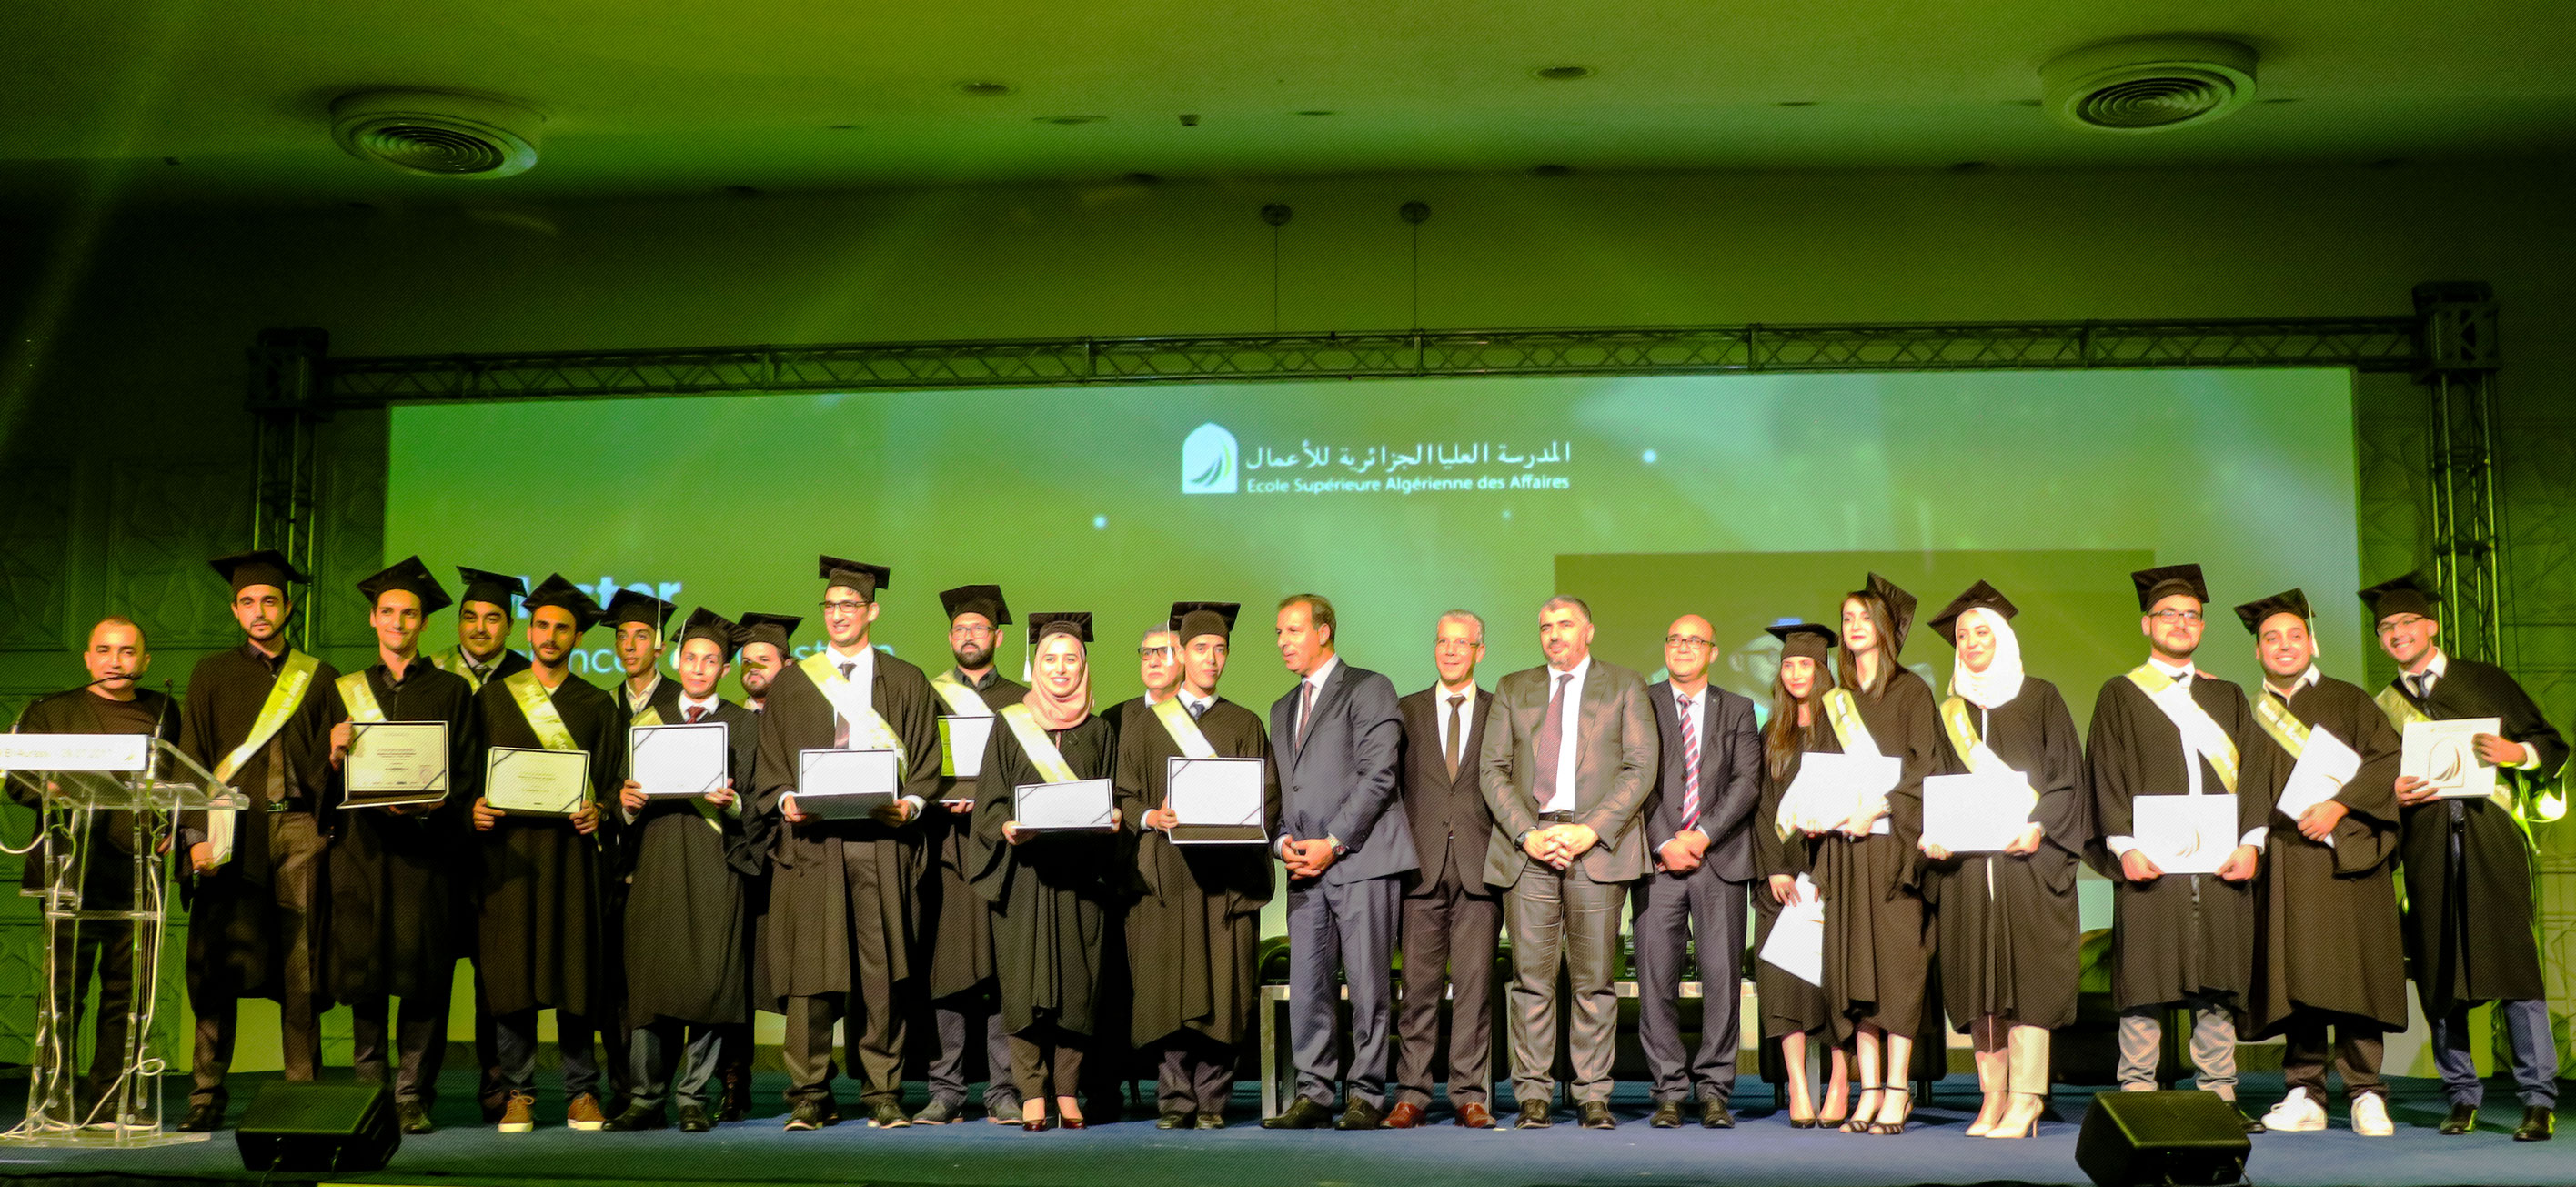 Remise de diplômes ESAA